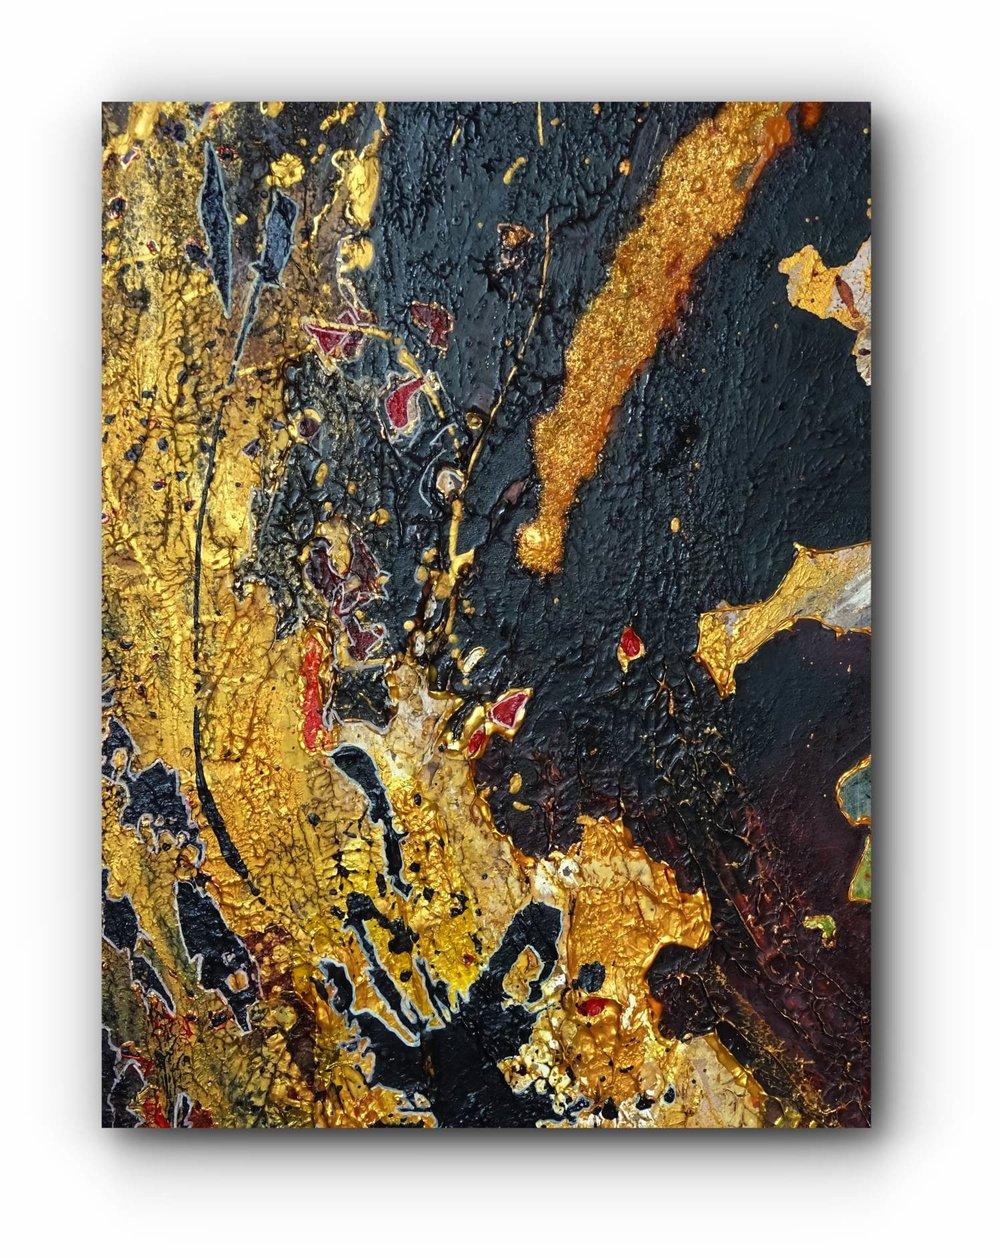 painting-detail-5-golden-sanctuary-artists-ingress-vortices.jpg